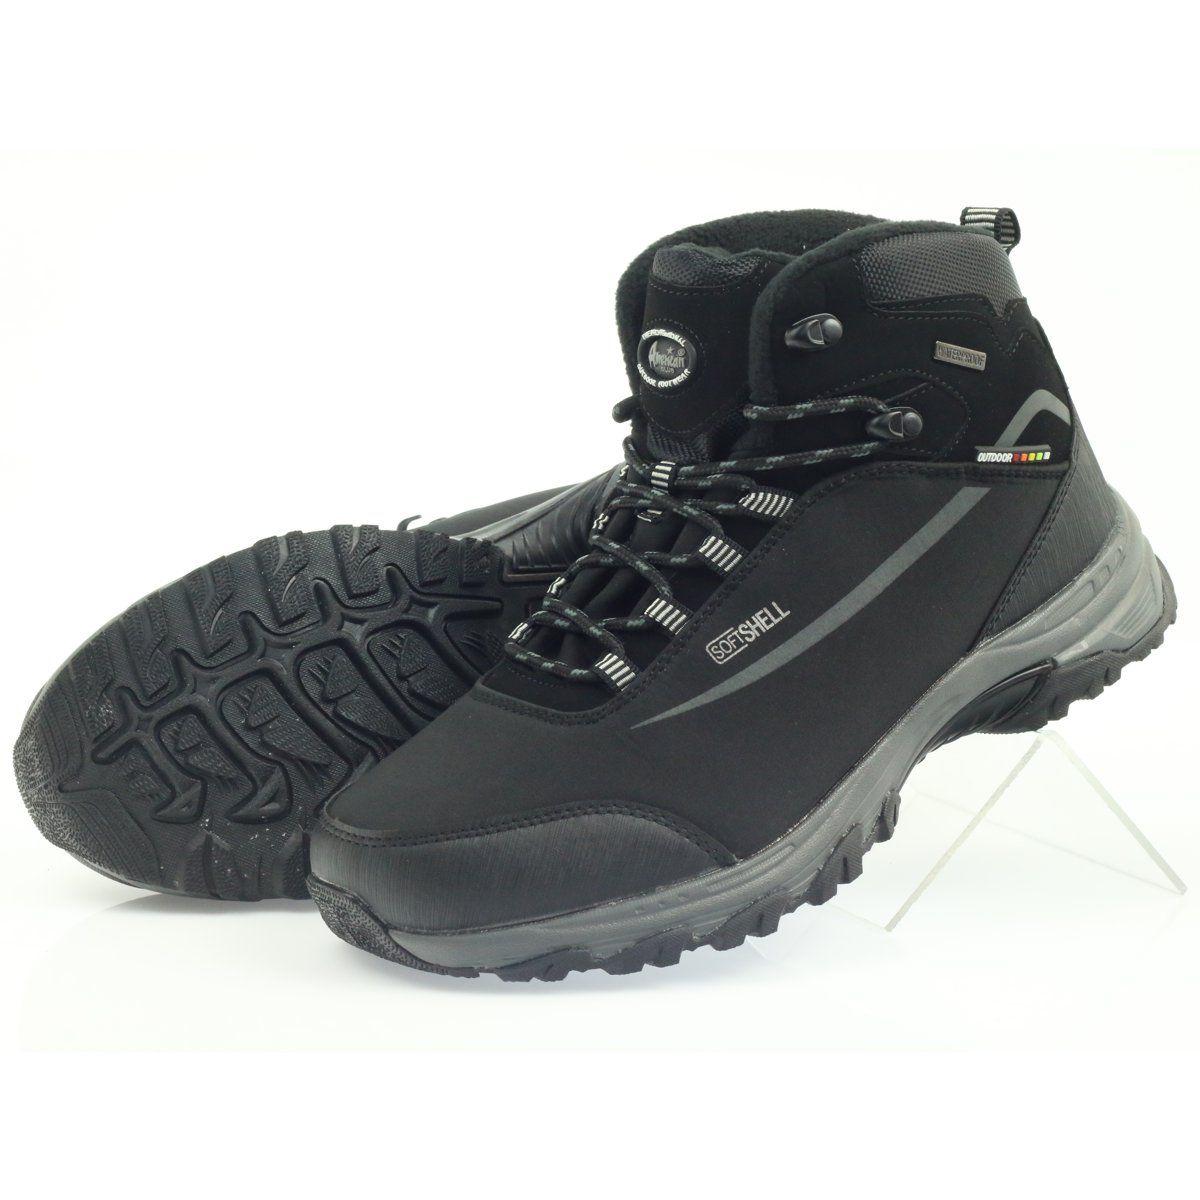 American Club American Trekkingi Buty Zimowe Z Membrana Czarne Boots Hiking Boots Mens Fashion